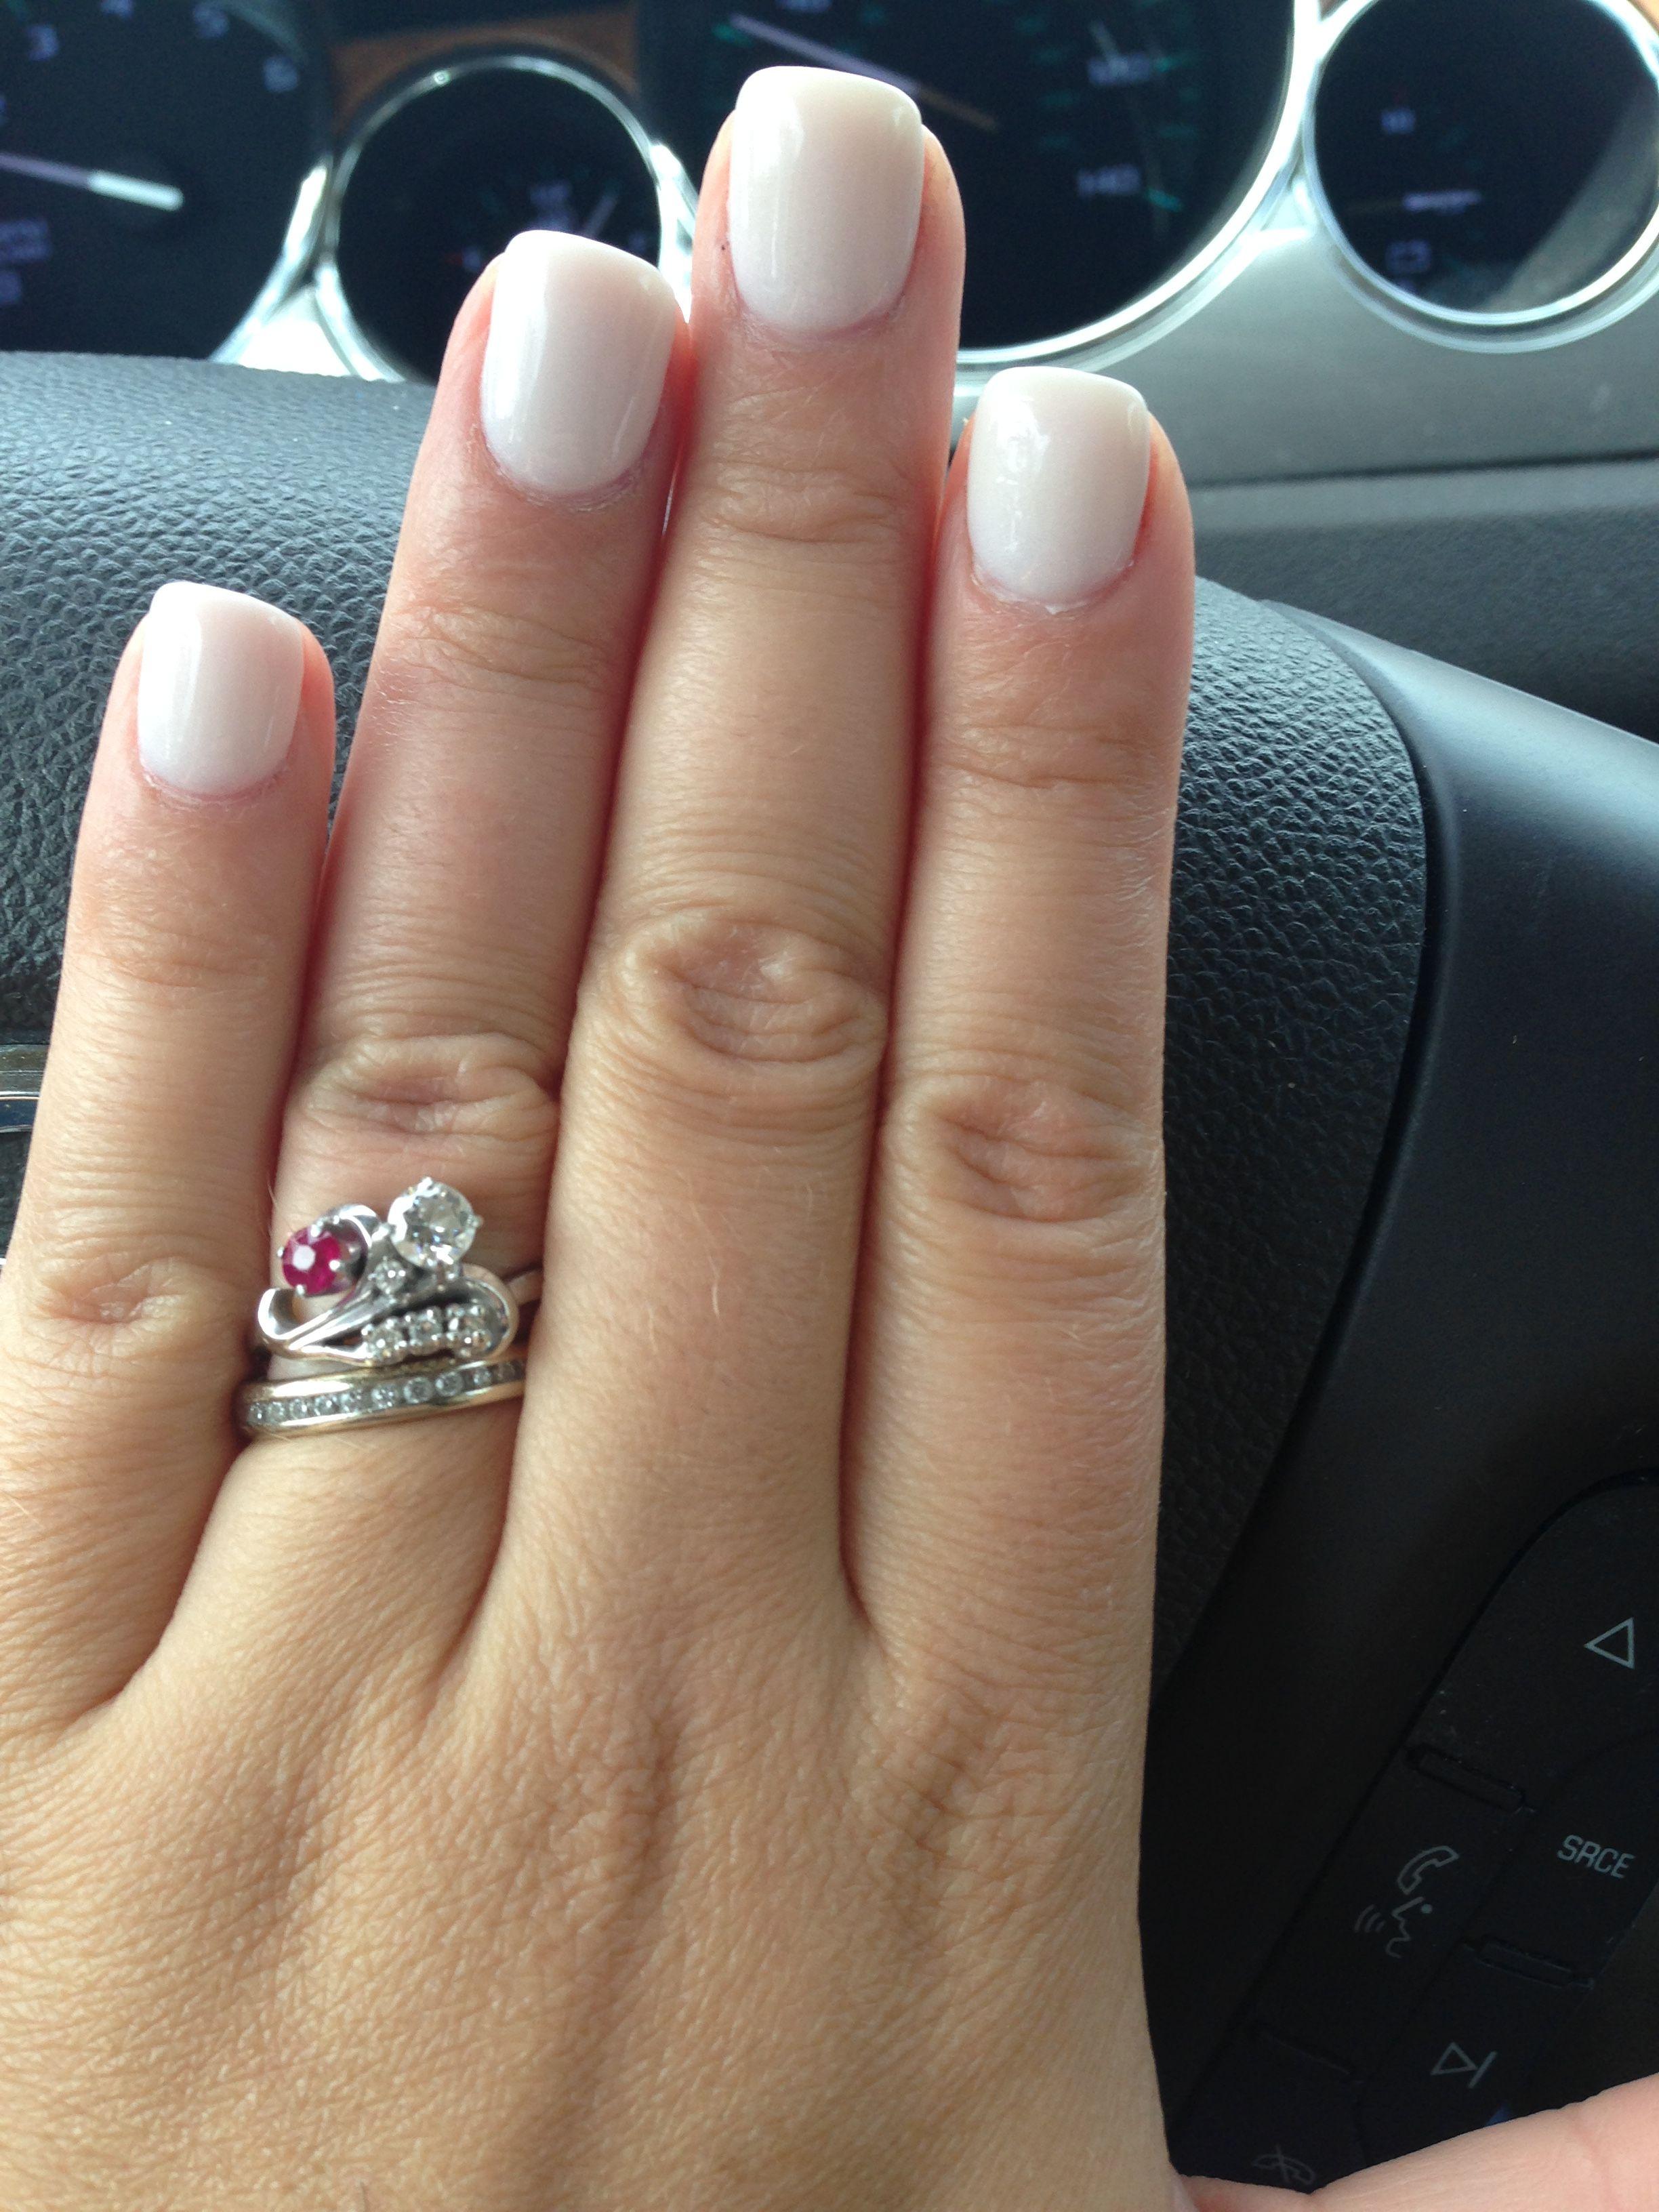 ANC white nails with Cinderella powder | Nails | Pinterest | White ...